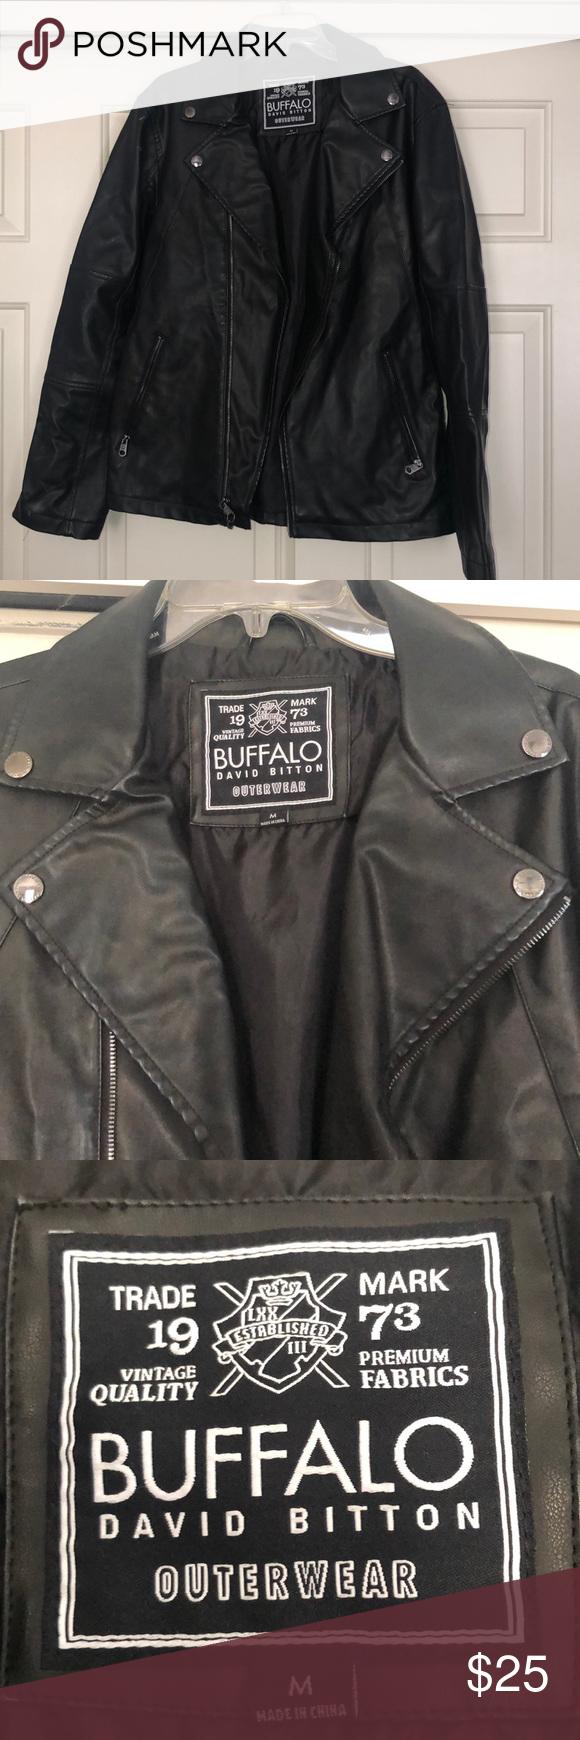 Black Buffalo By David Bitton Leather Jacket Leather Jacket Leather Jacket Black Jackets [ 1740 x 580 Pixel ]